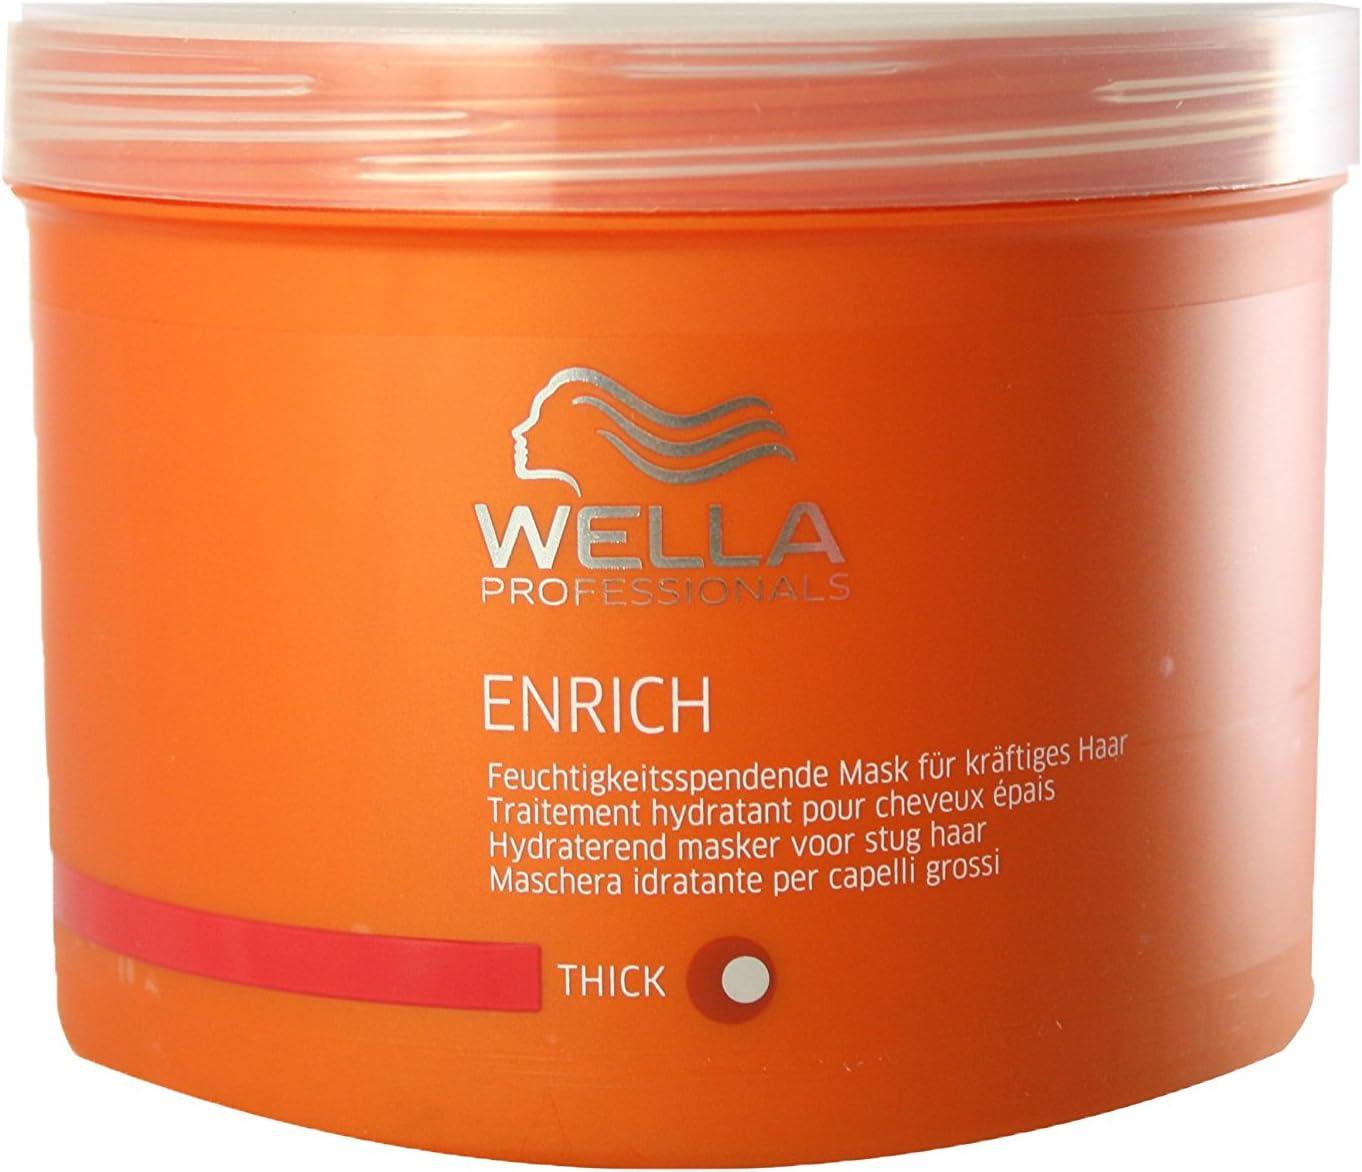 Wella Enrich Mask Thick Hair Mascarilla - 500 ml